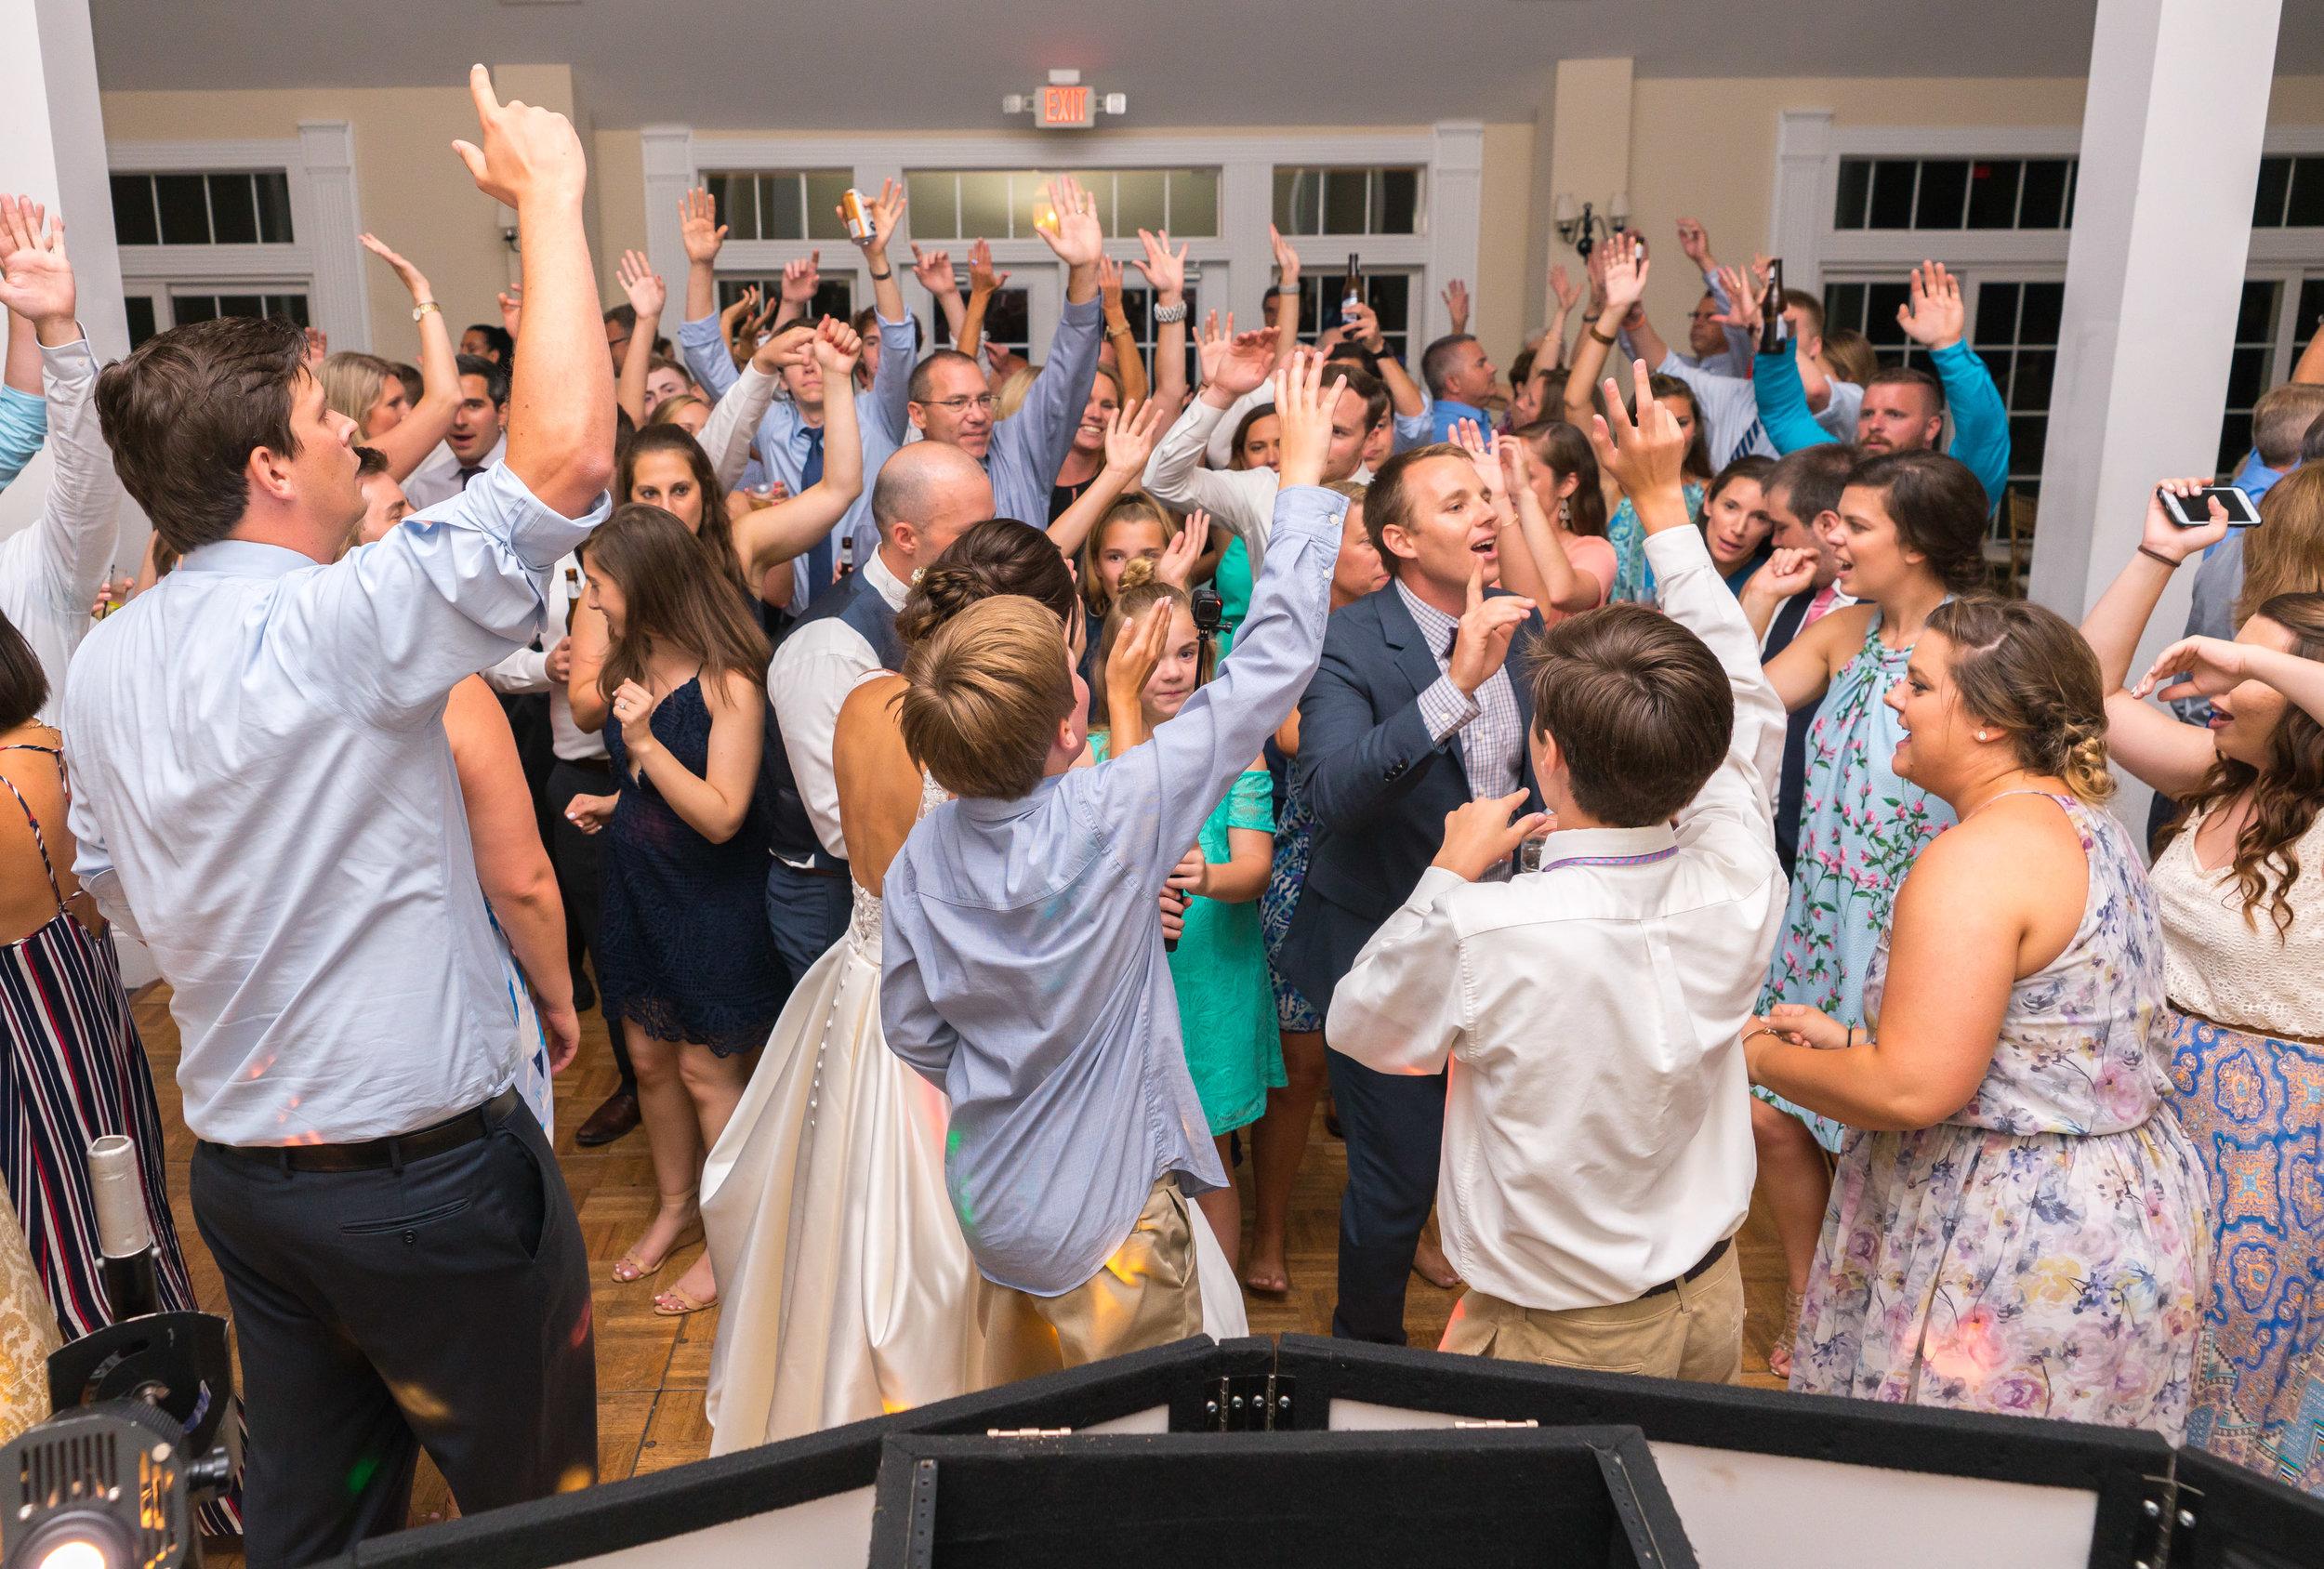 Wedding DJ in Washington DC and Maryland